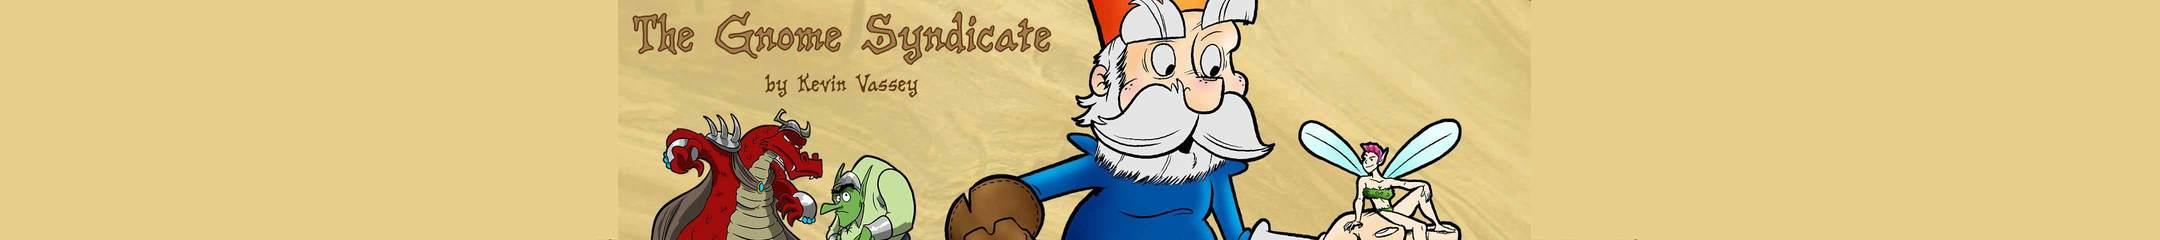 Gnome Syndicate